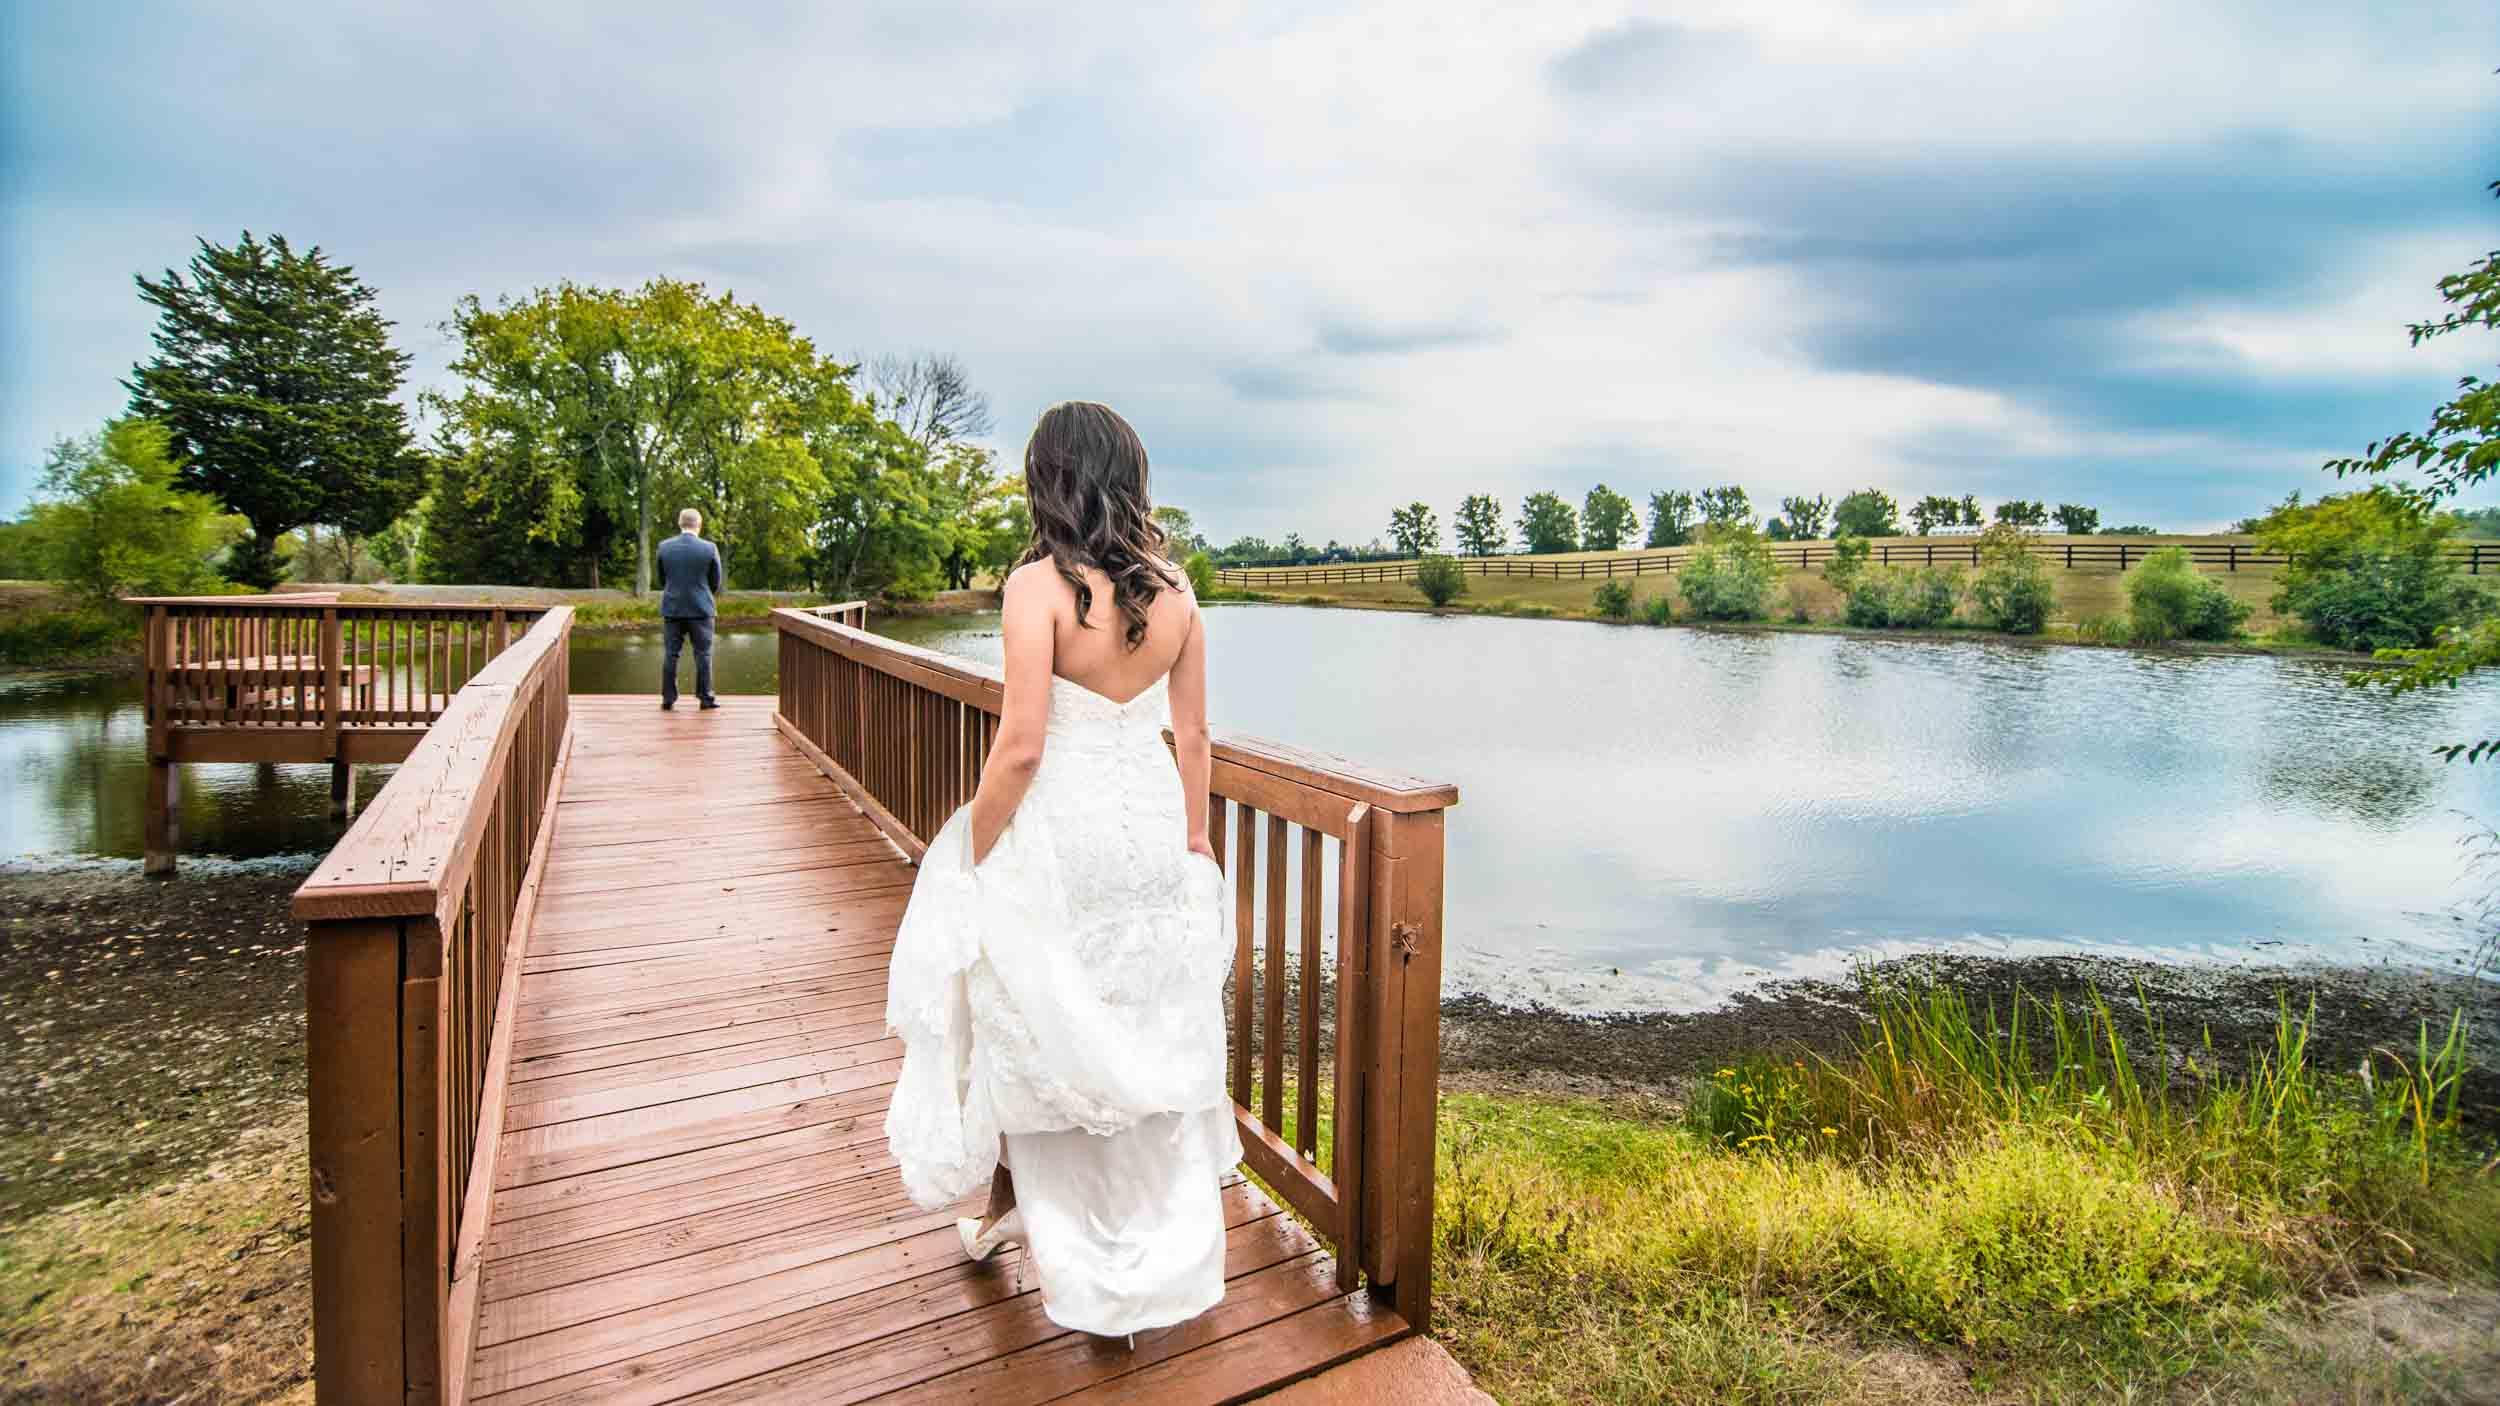 dc+metro+wedding+photographer+vadym+guliuk+photography+weddings+first-look-2022.jpg